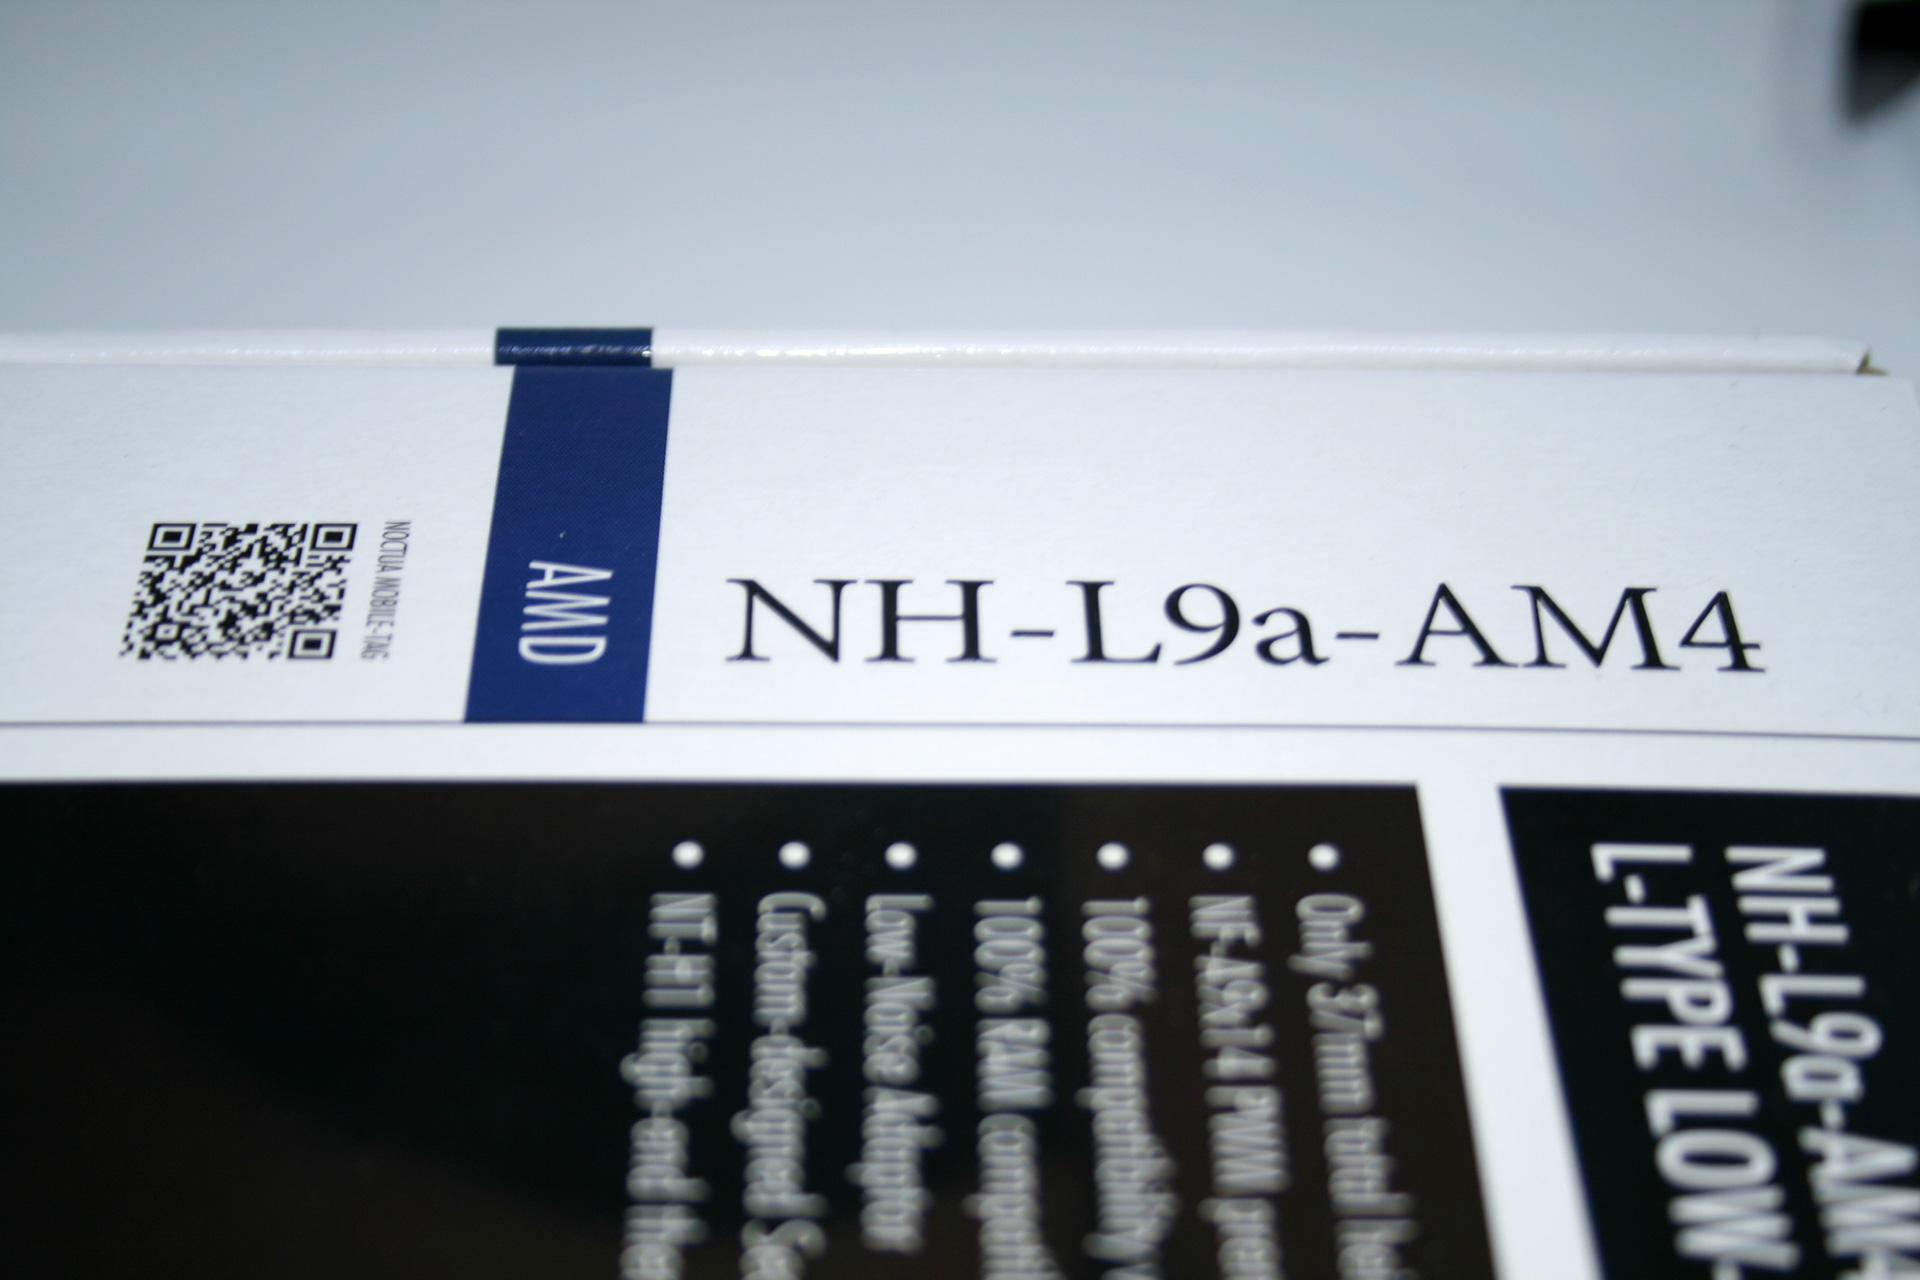 Обзор и тестирование кулера Noctua NH-L9a-AM4